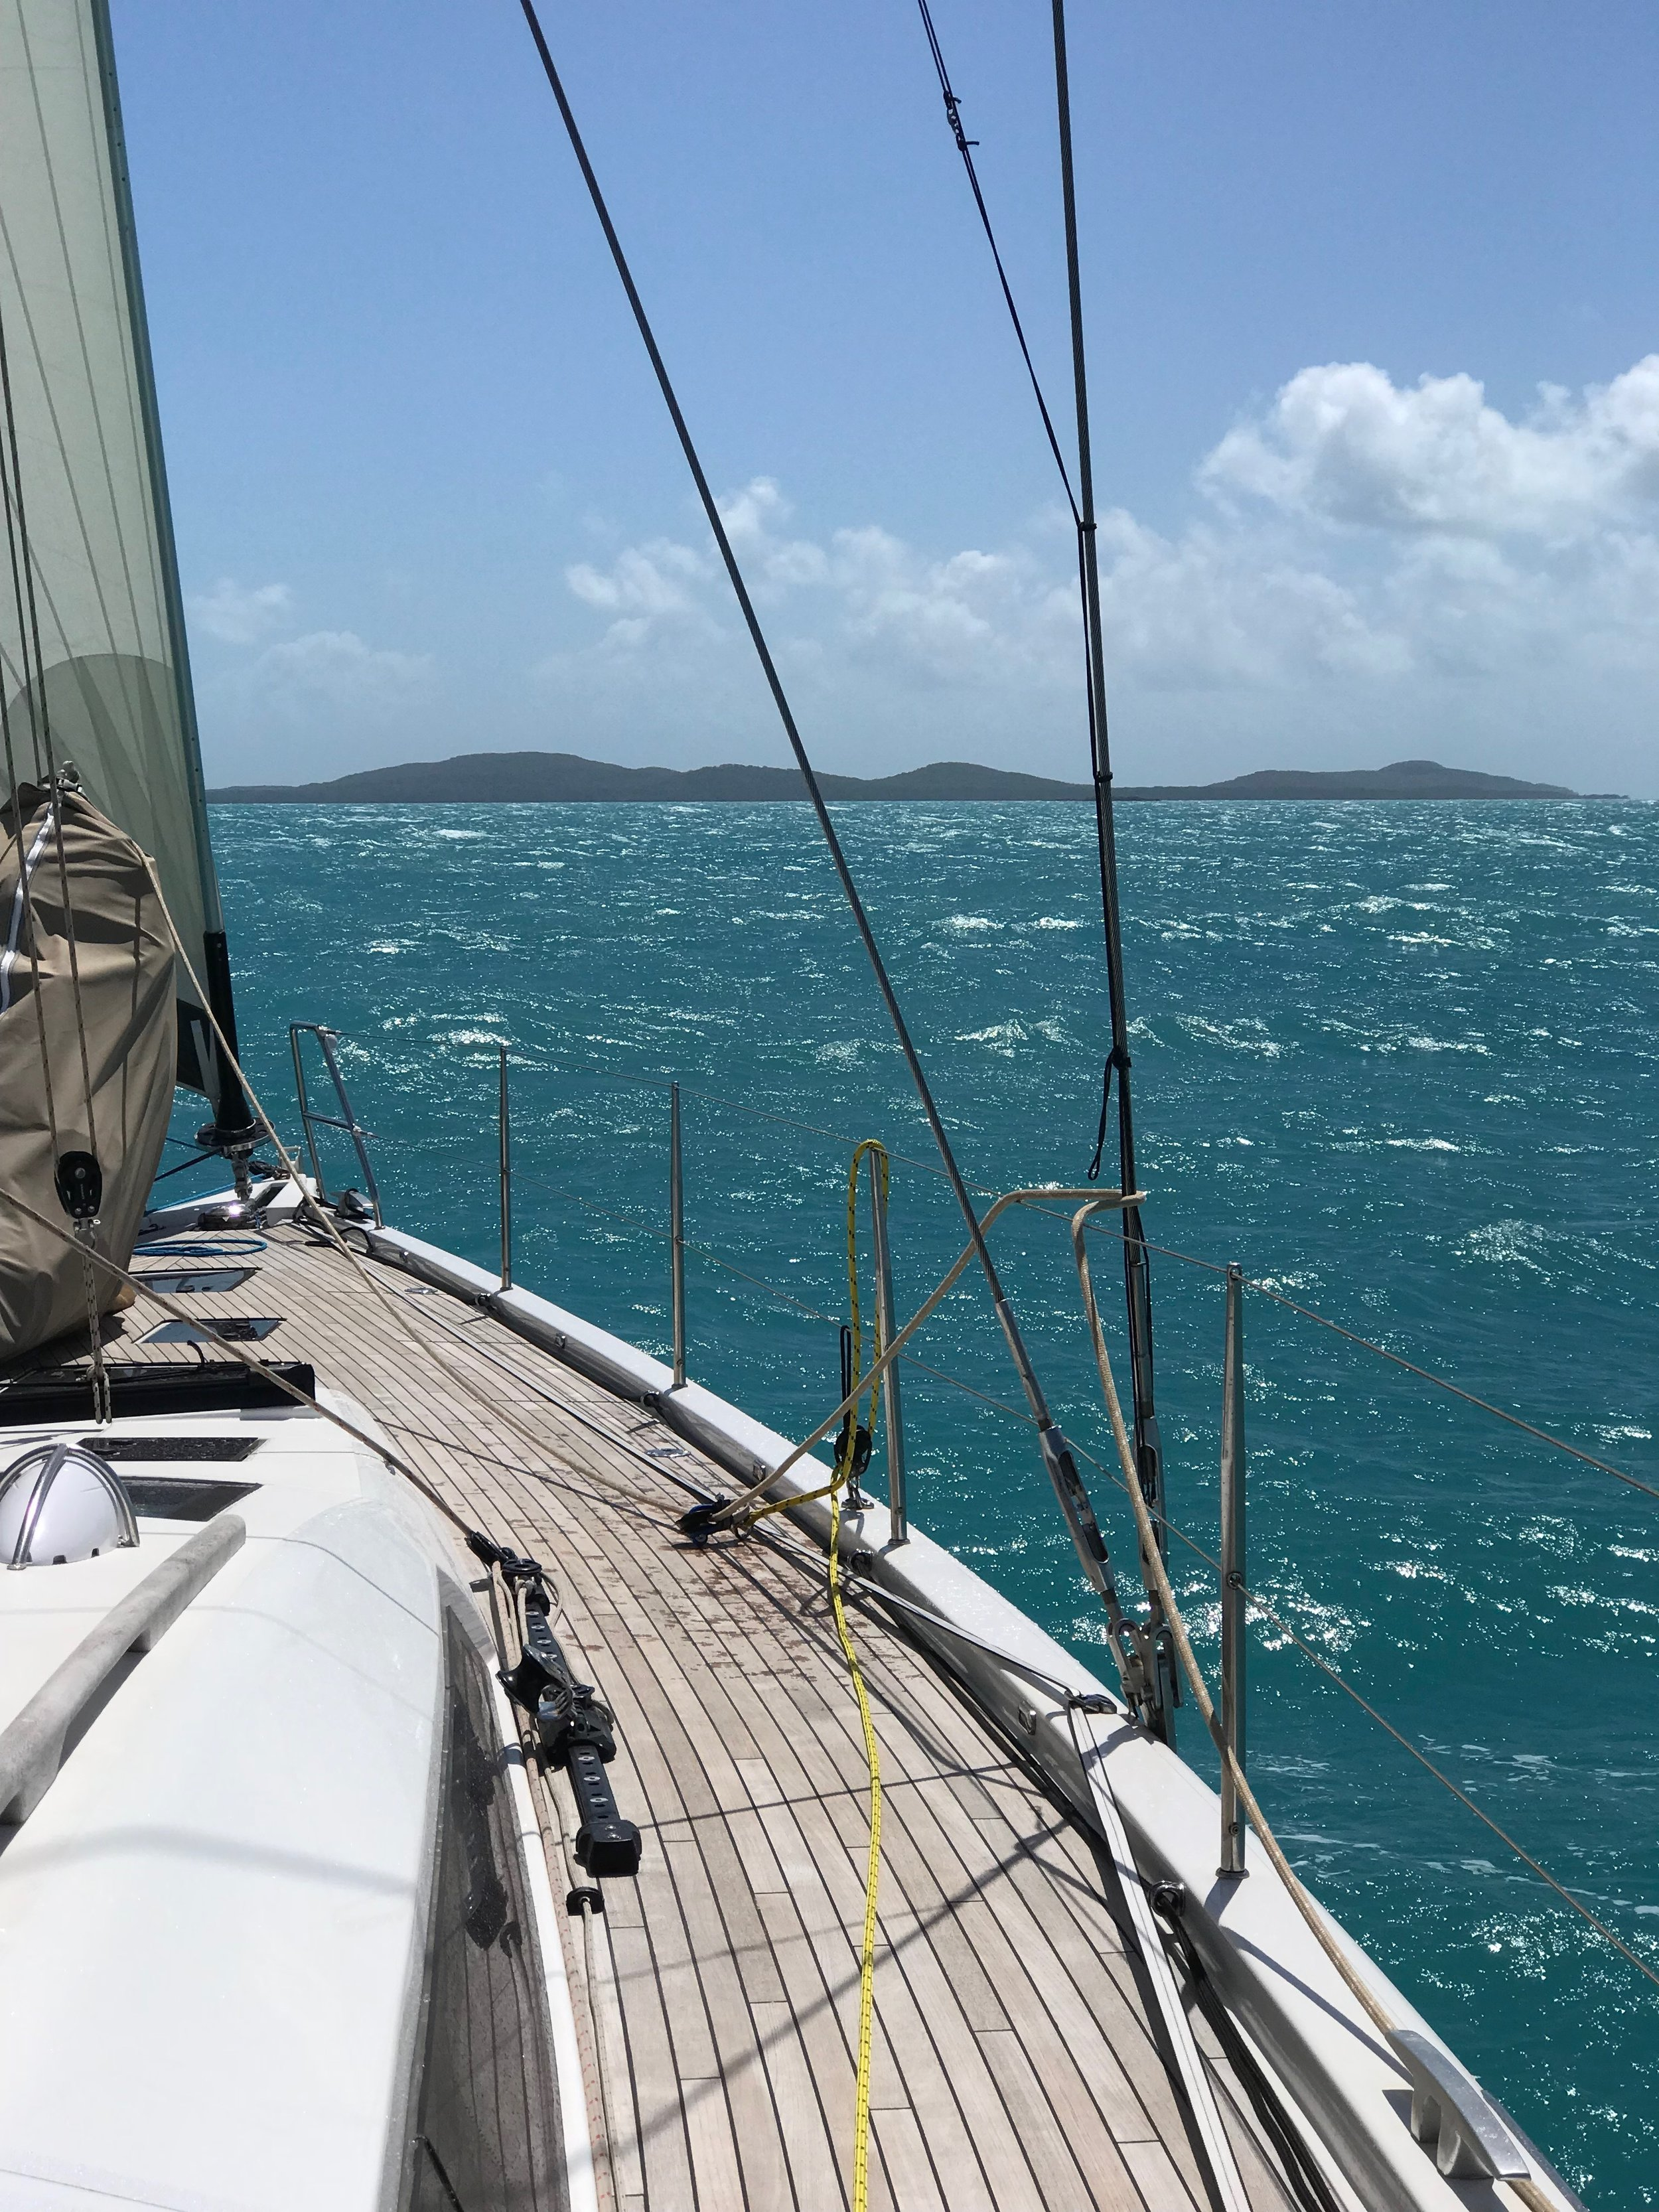 Passing Wednesday Island